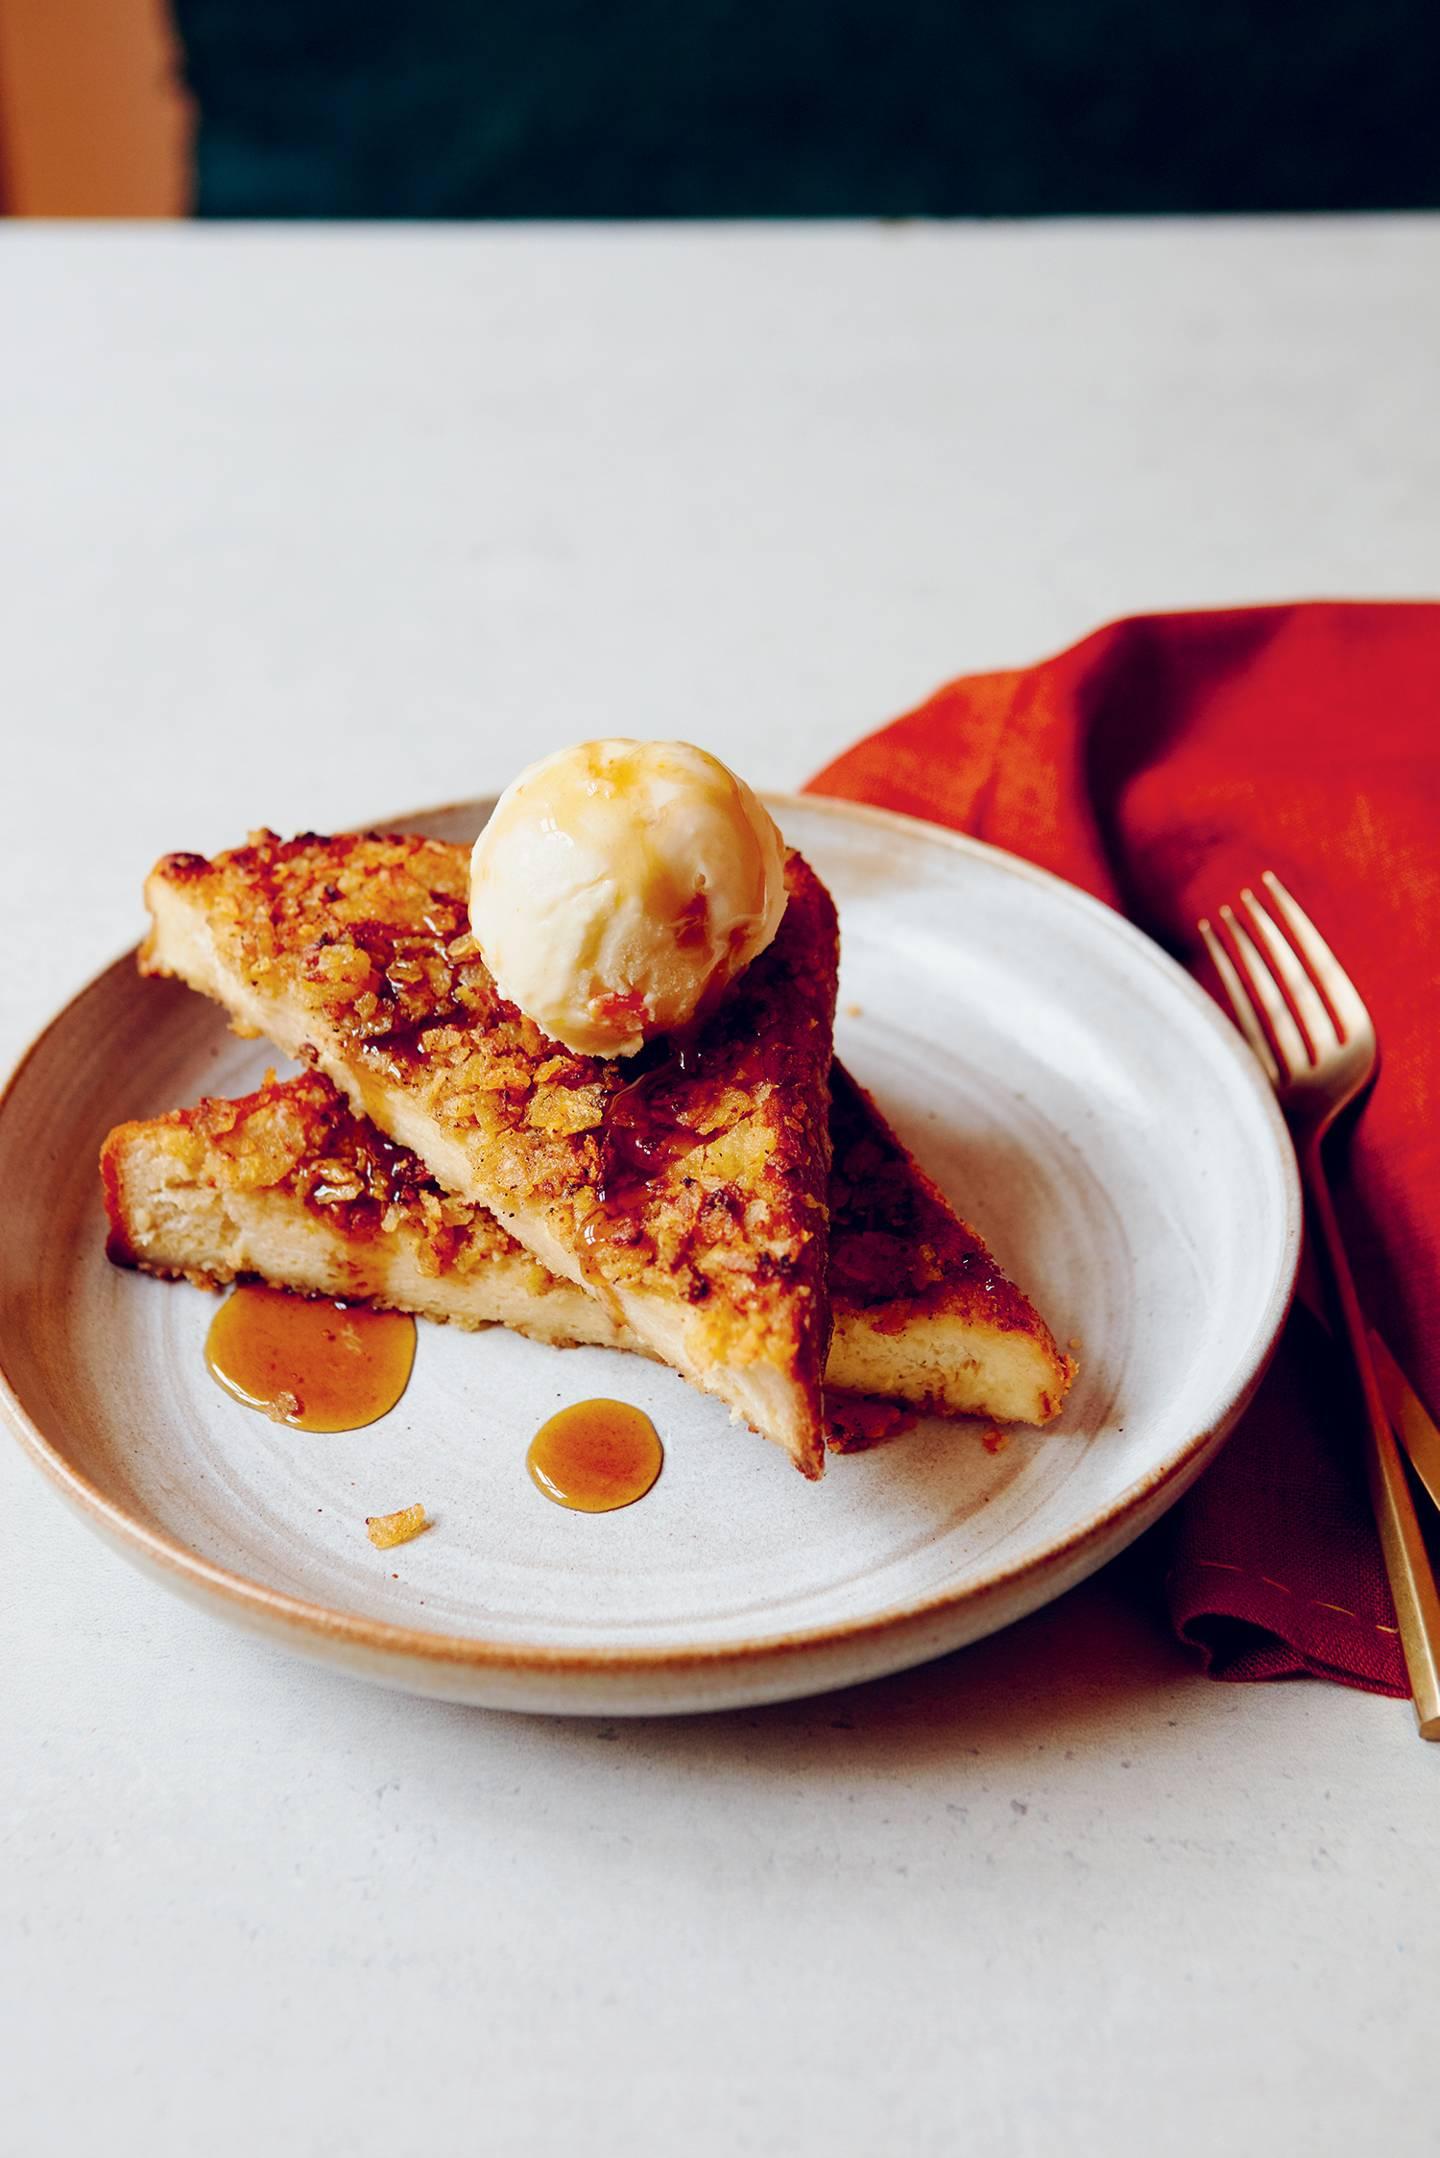 Crunchy French toast with mandarin ice cream